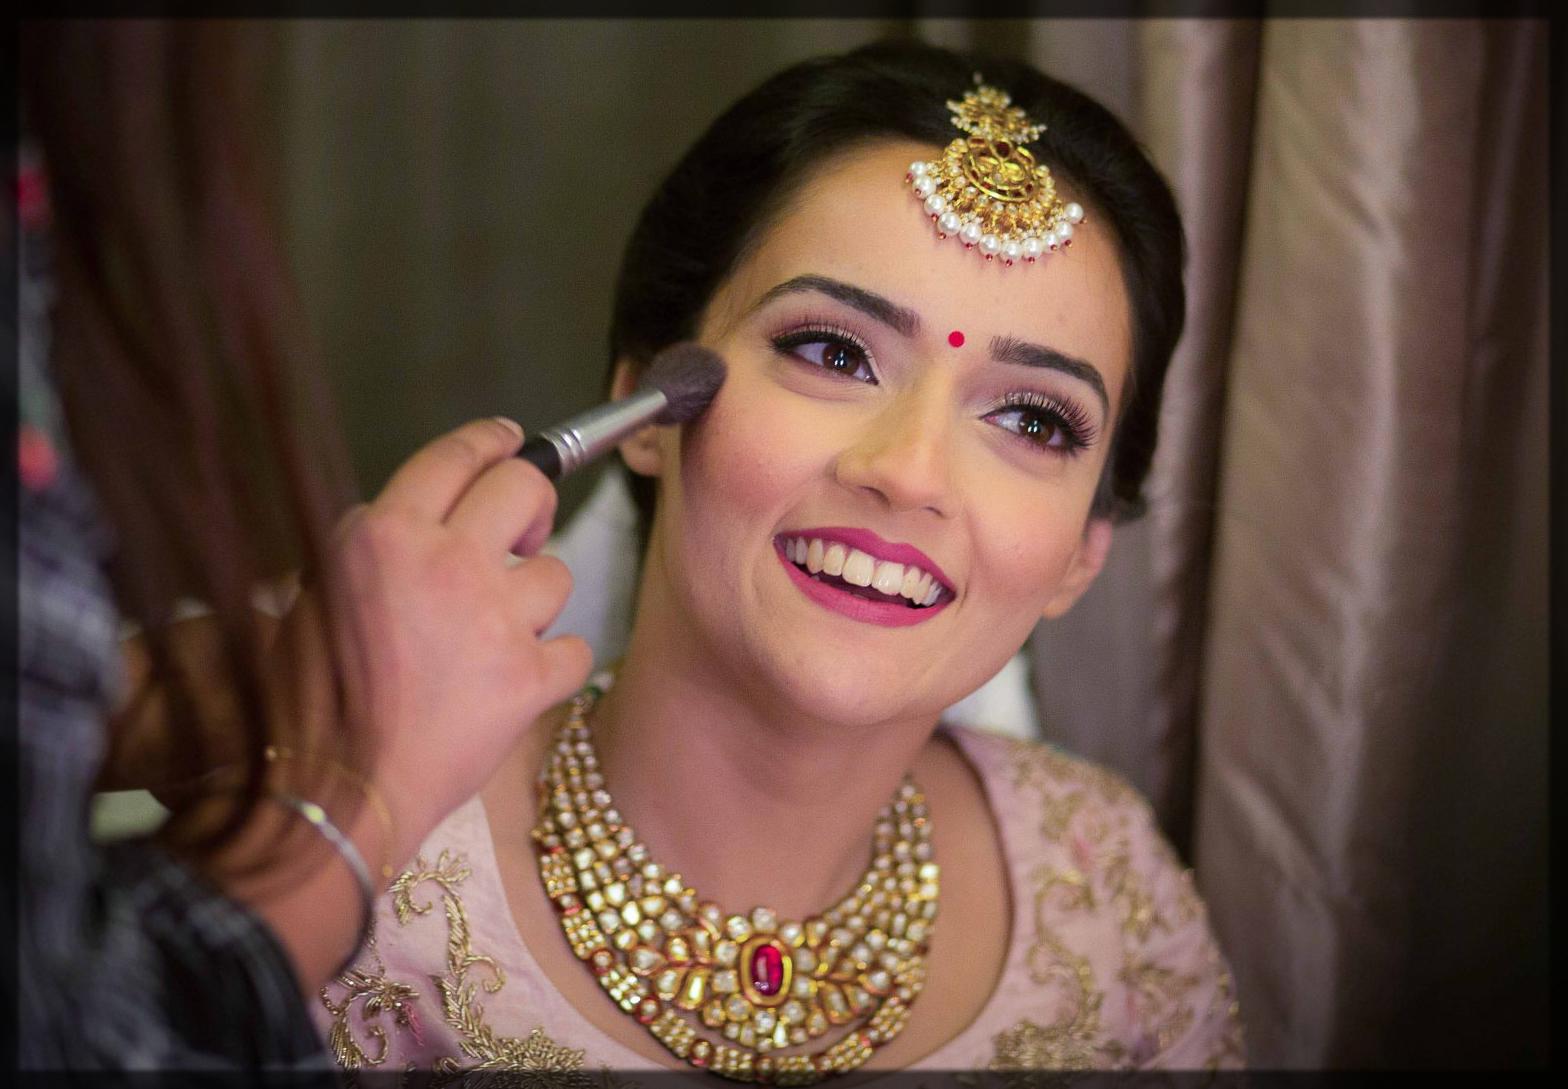 apply blush on the bride